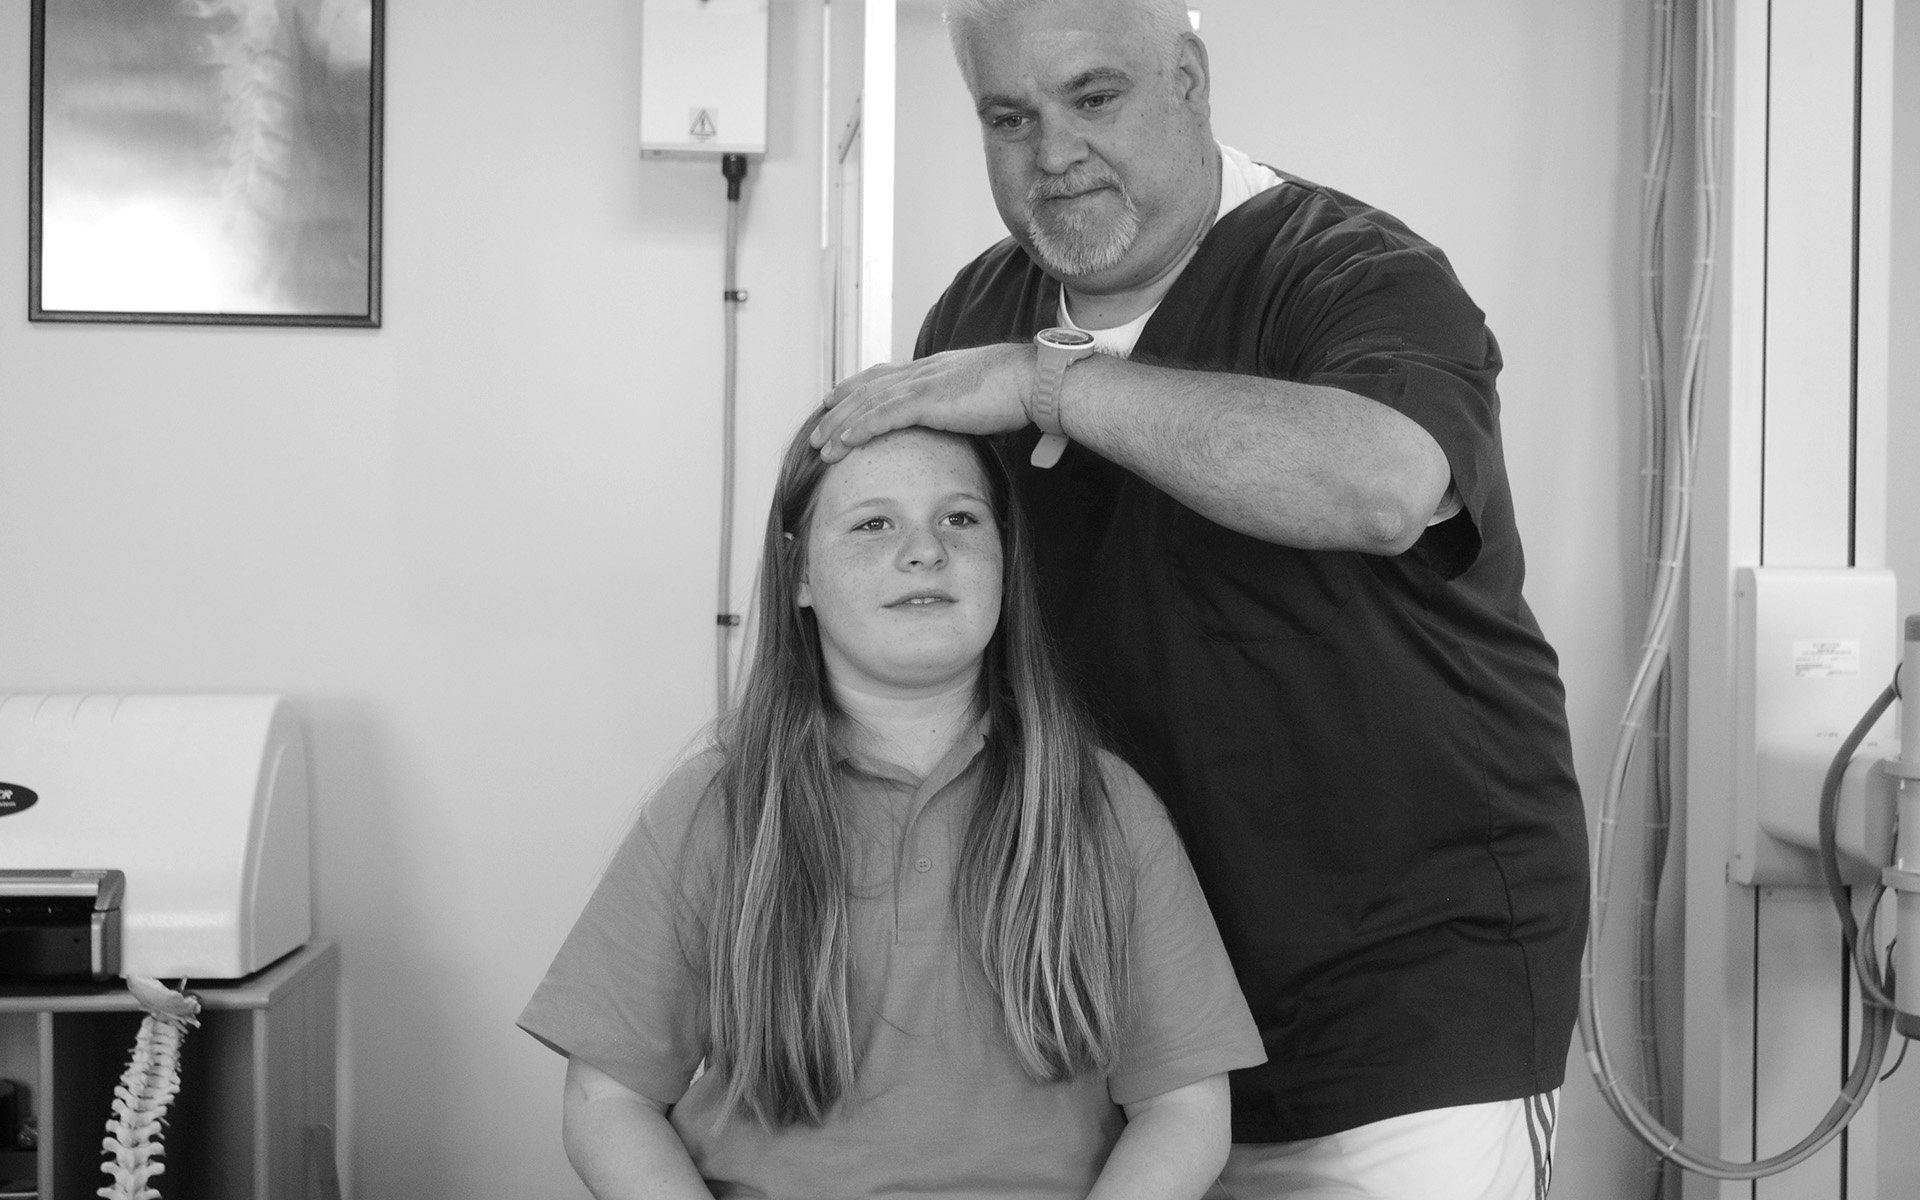 Chiropractor, Maple Chiropractic Clinic, Stevenage